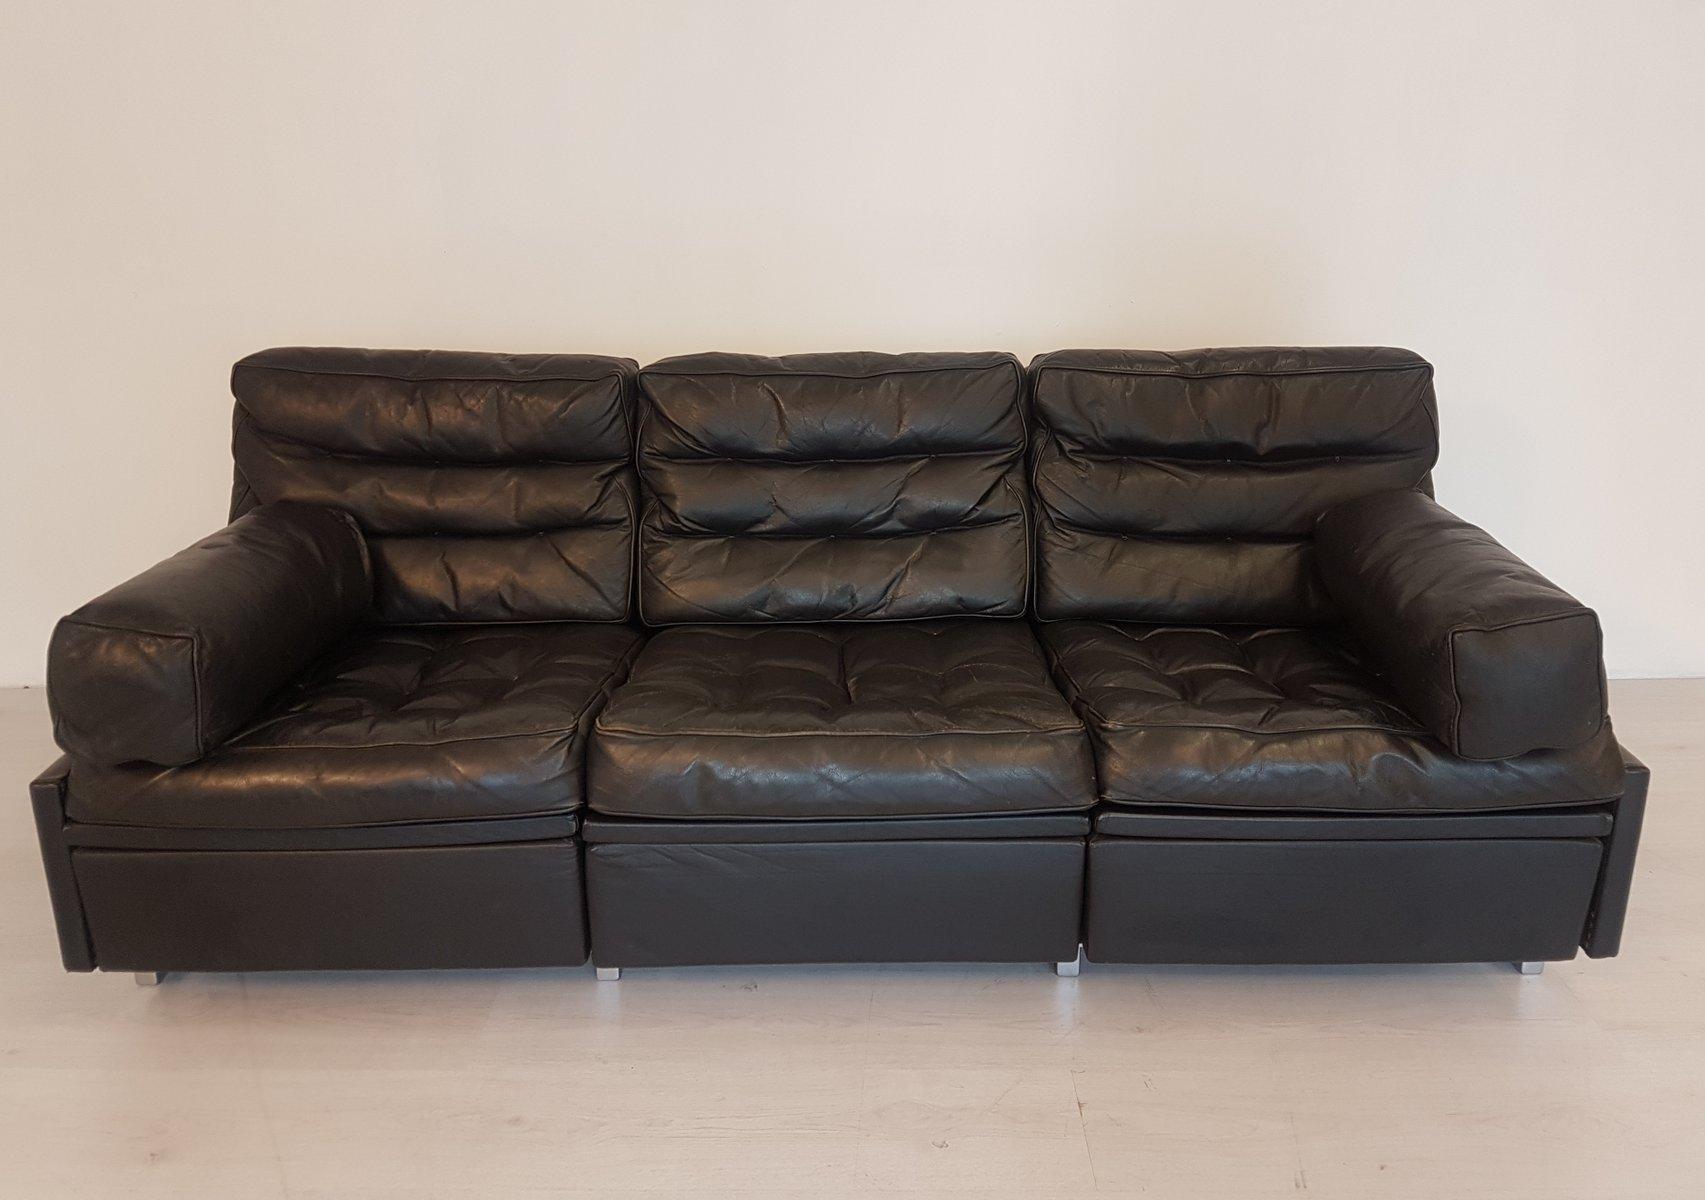 ds 3a 3 sitzer new yorker sofa ottomane von de sede 1970er bei pamono kaufen. Black Bedroom Furniture Sets. Home Design Ideas